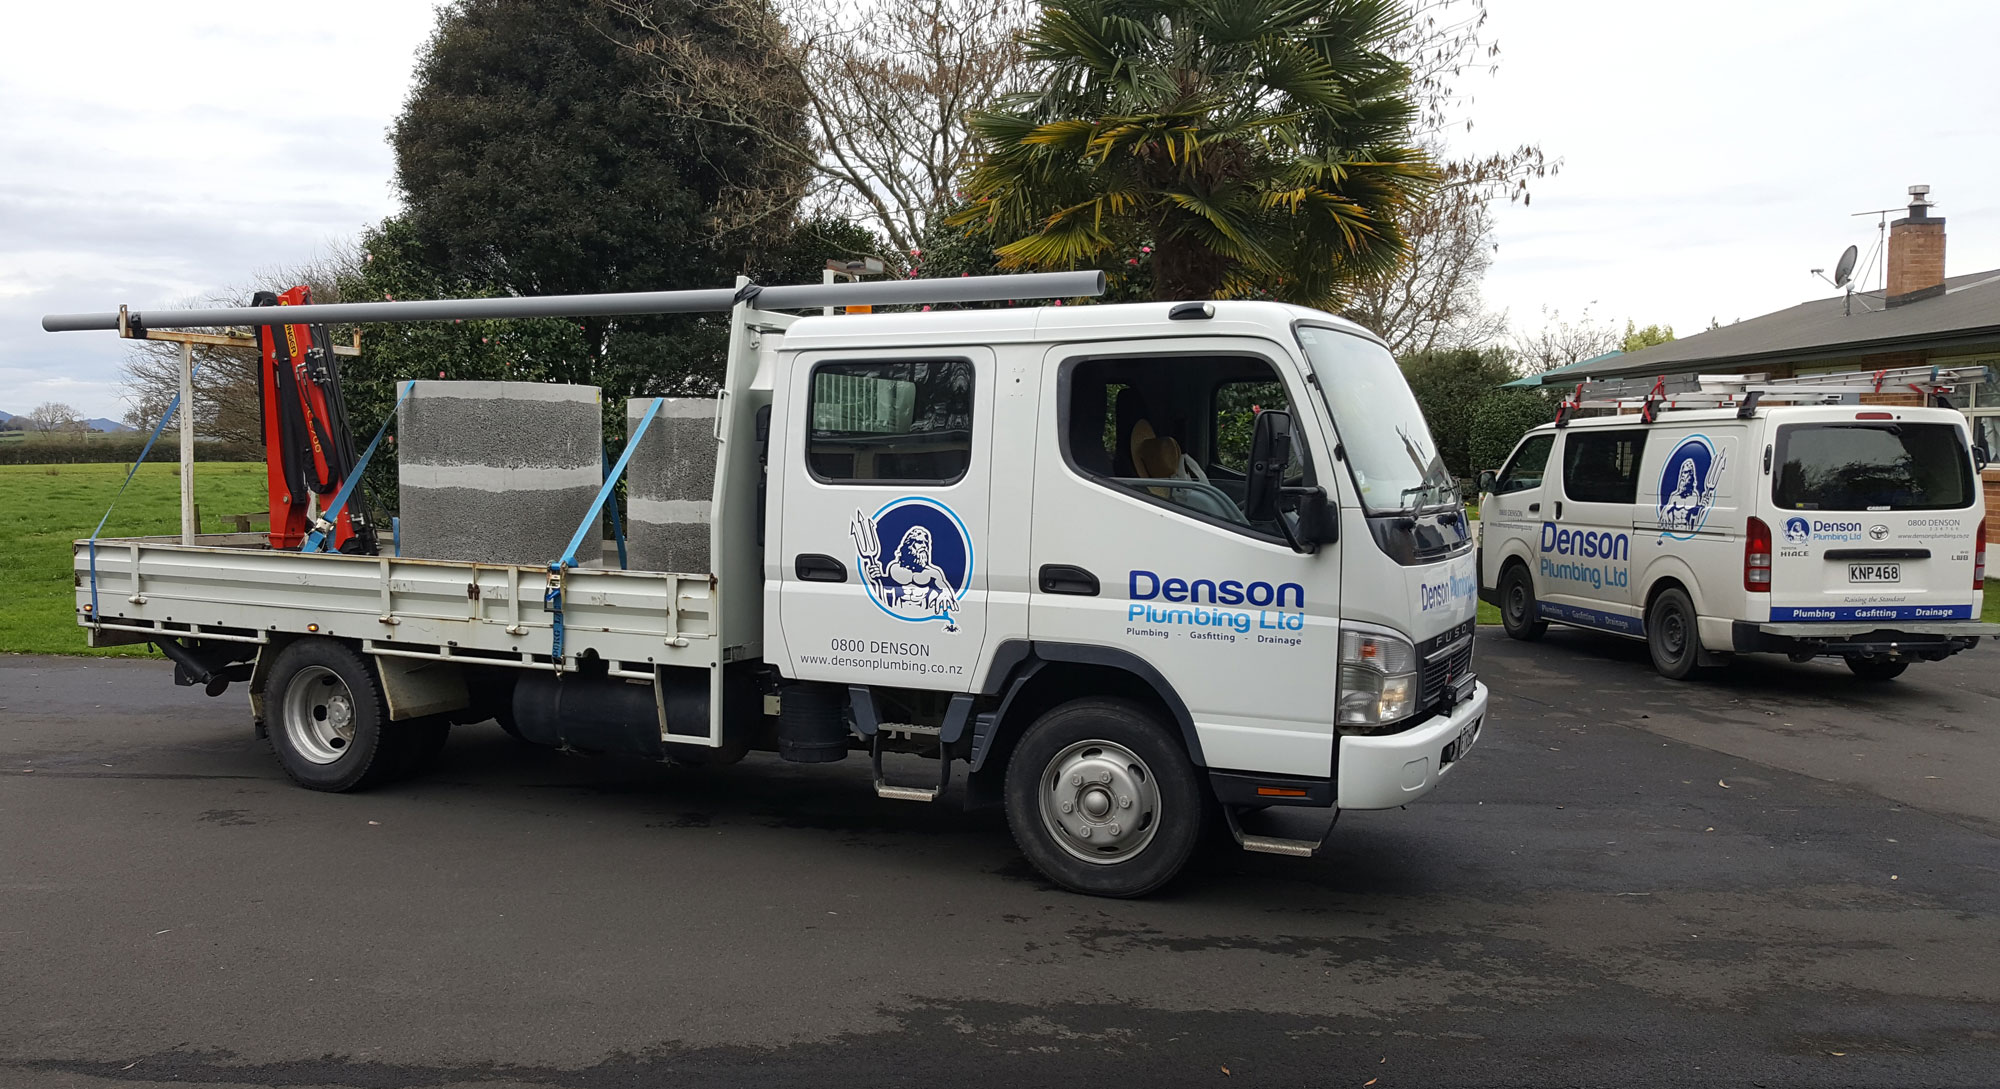 Denson-Plumbing-Maintenance.jpg